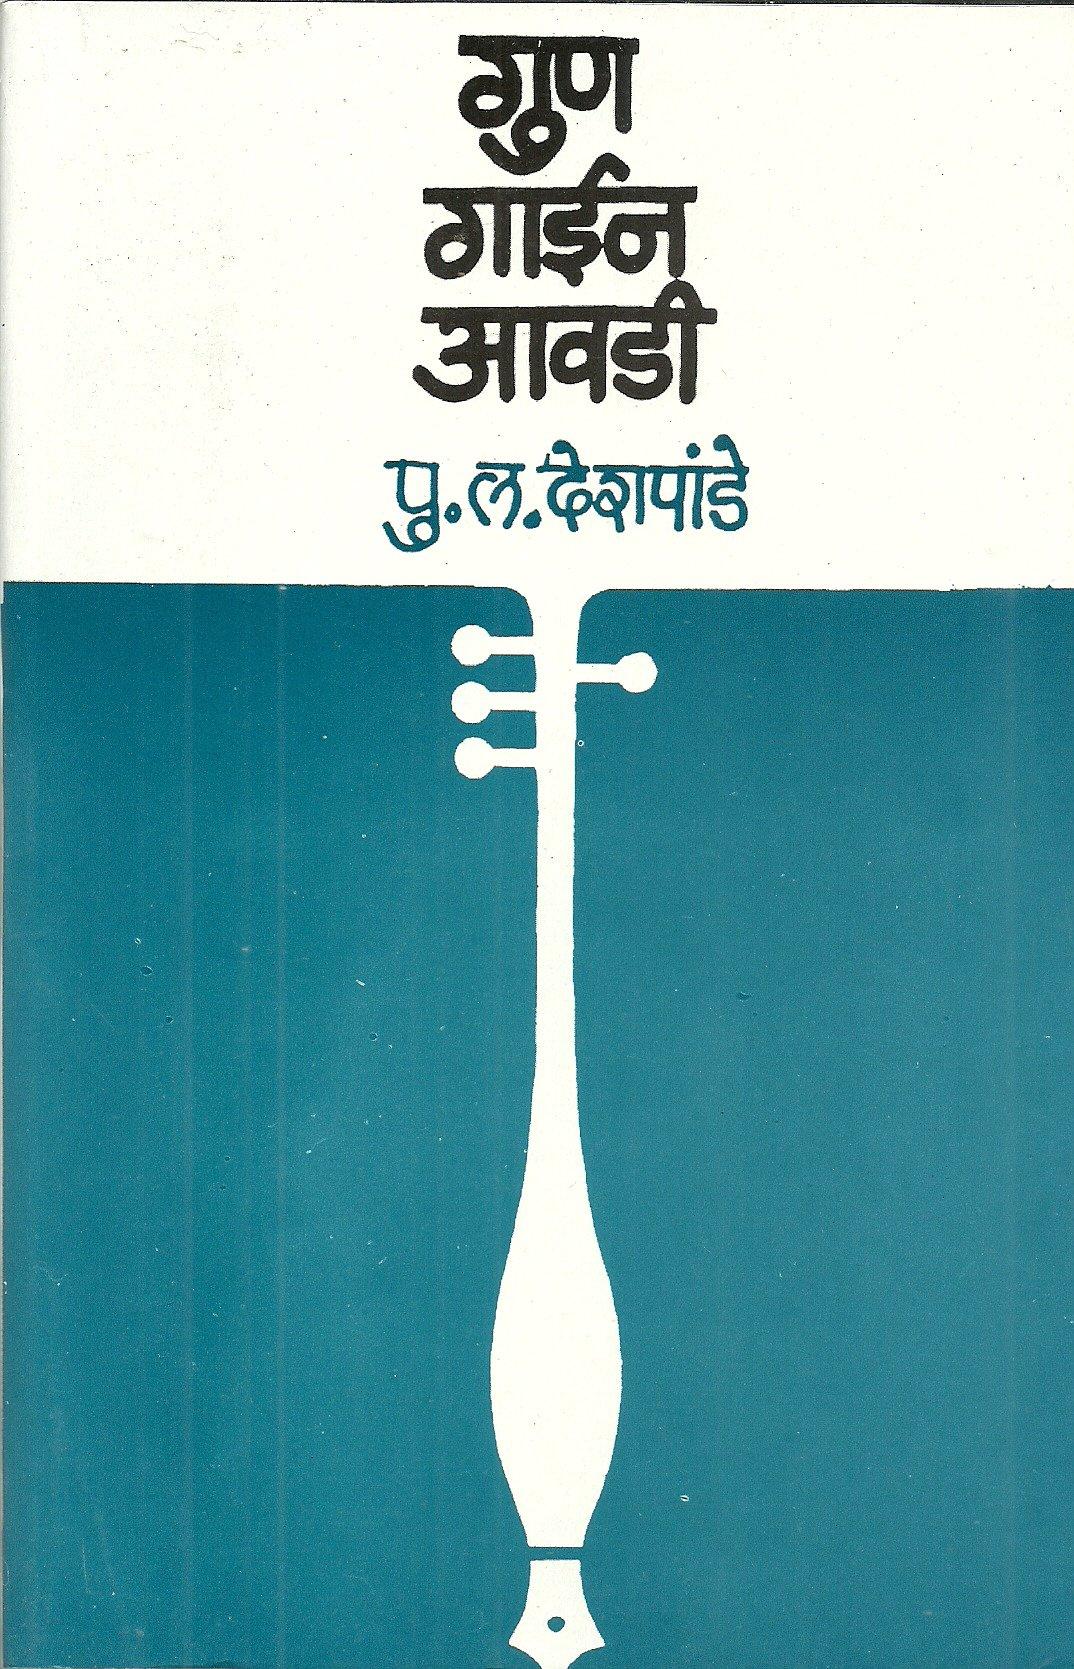 Buy Gun Gayin Awadi 14th Edition Book Online at Low Prices in India | Gun  Gayin Awadi 14th Edition Reviews & Ratings - Amazon.in